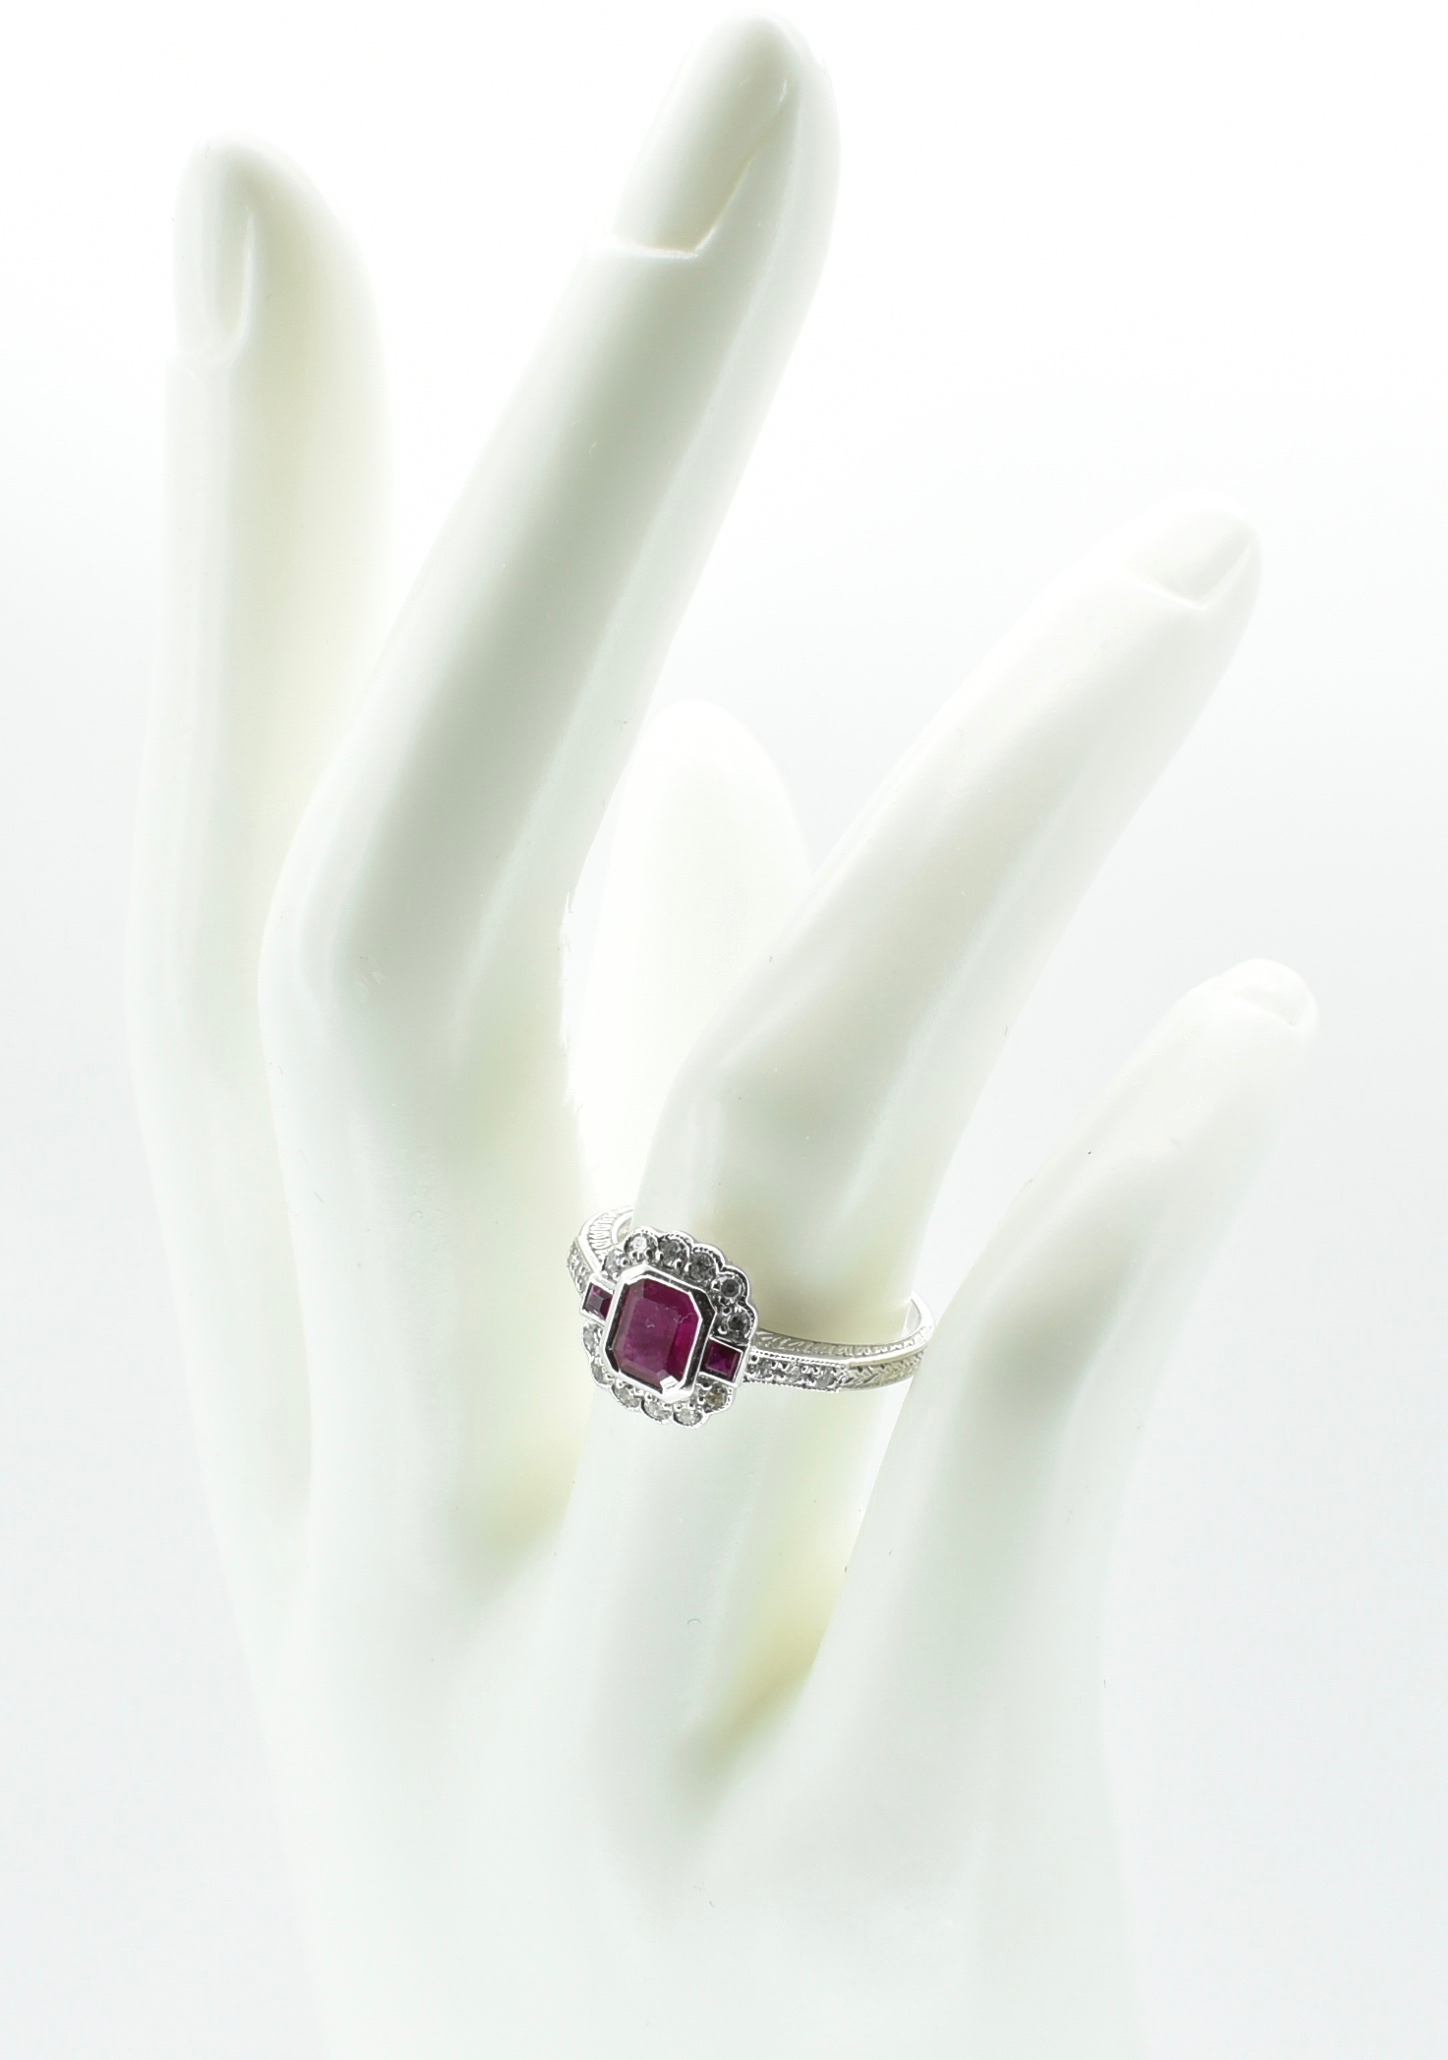 18CT WHITE GOLD RUBY & DIAMOND RING - Image 2 of 5